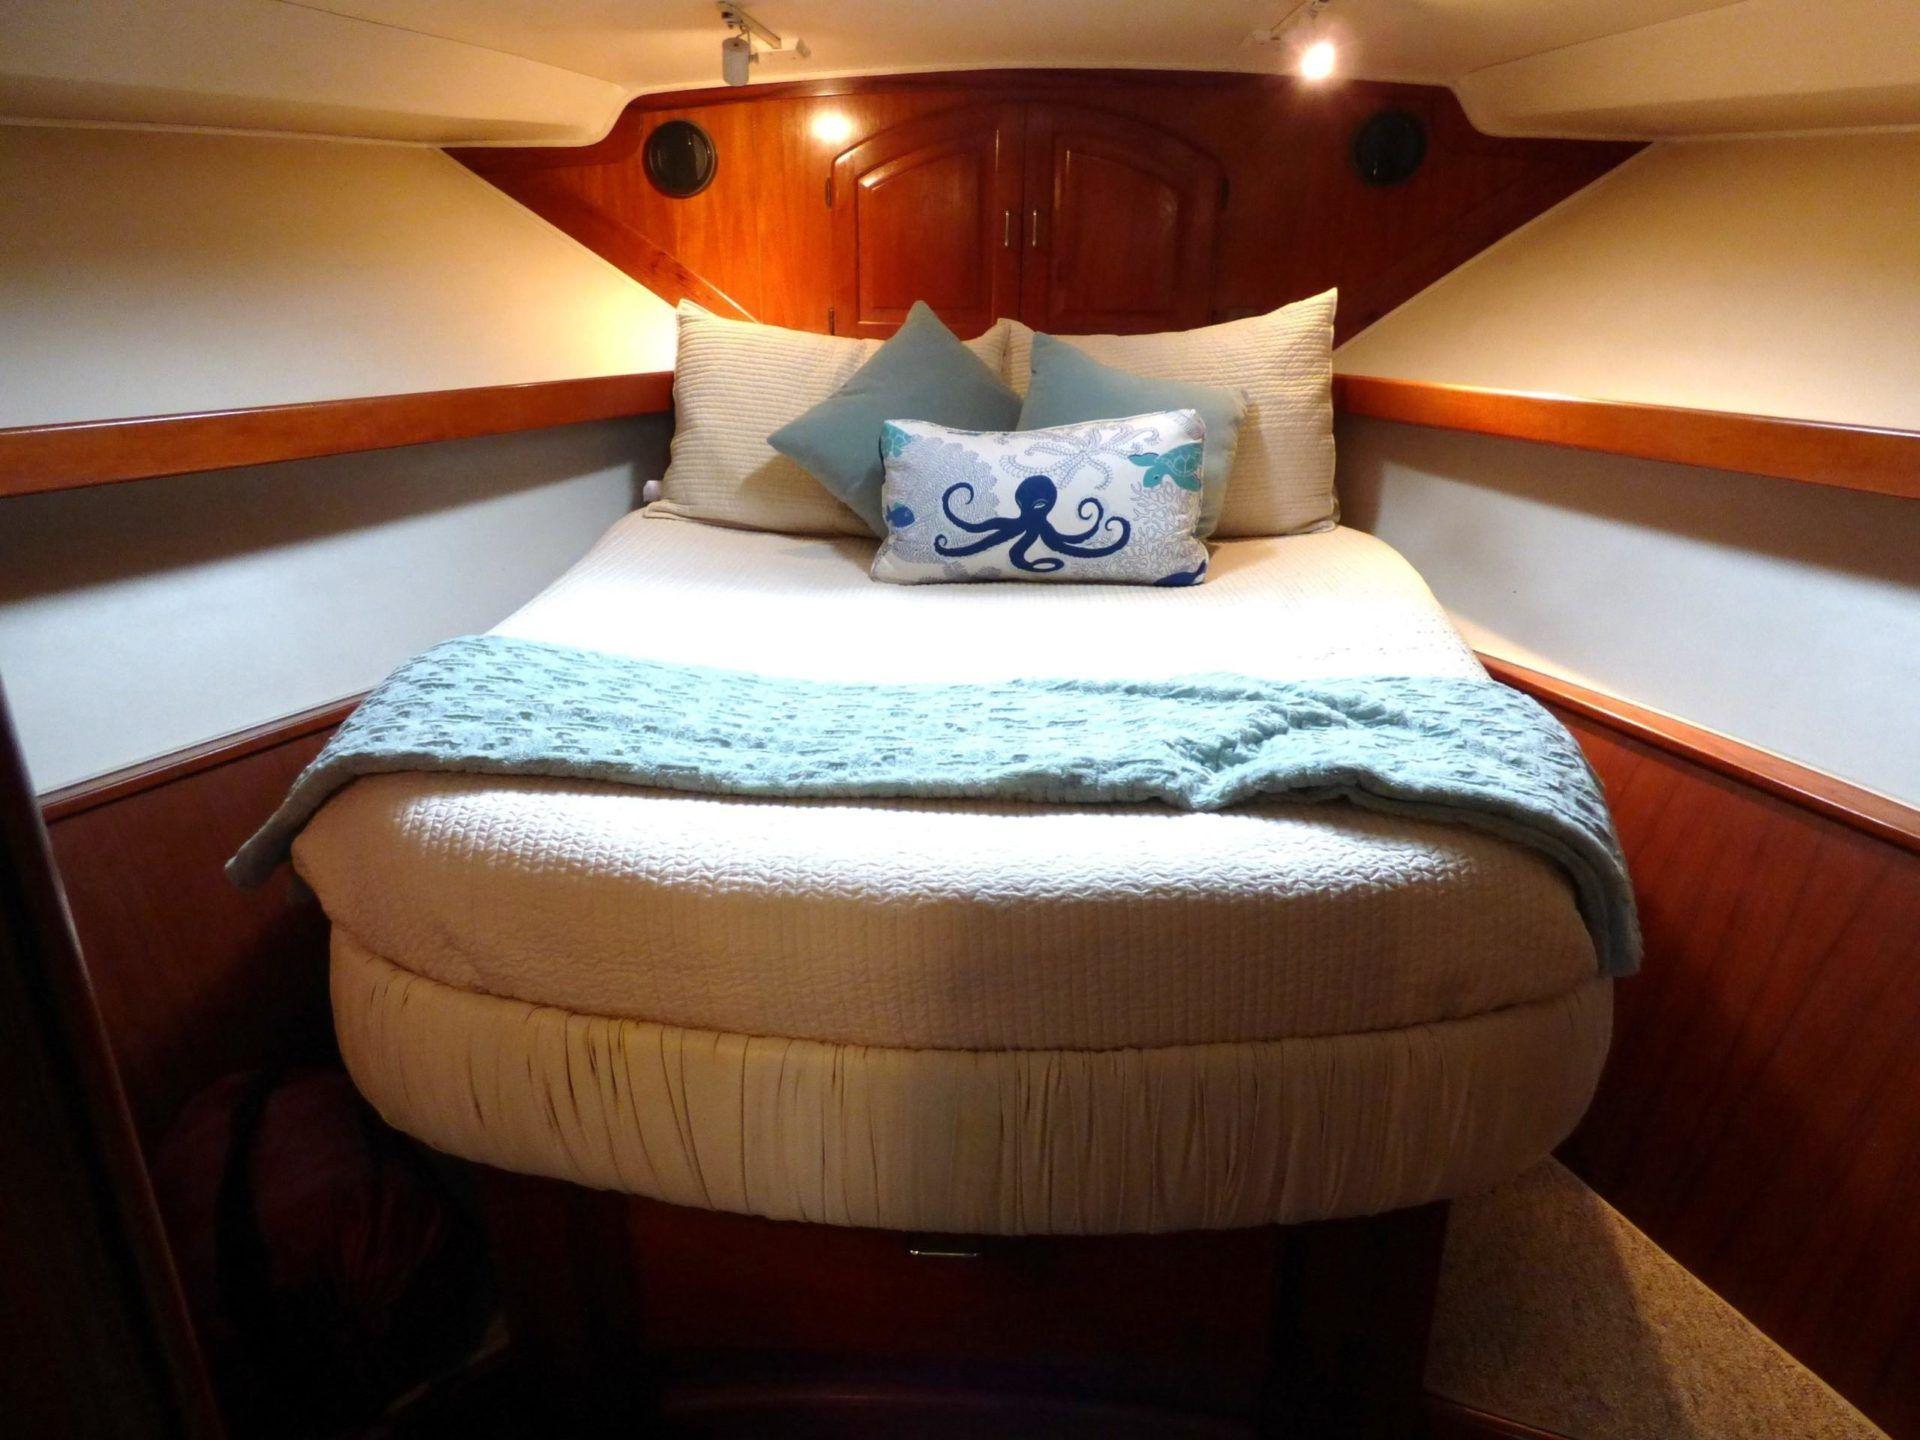 45 californian 45 motor yacht 1989 seacoast yachts teak storage wicker table and chairs teak flooring pinterest